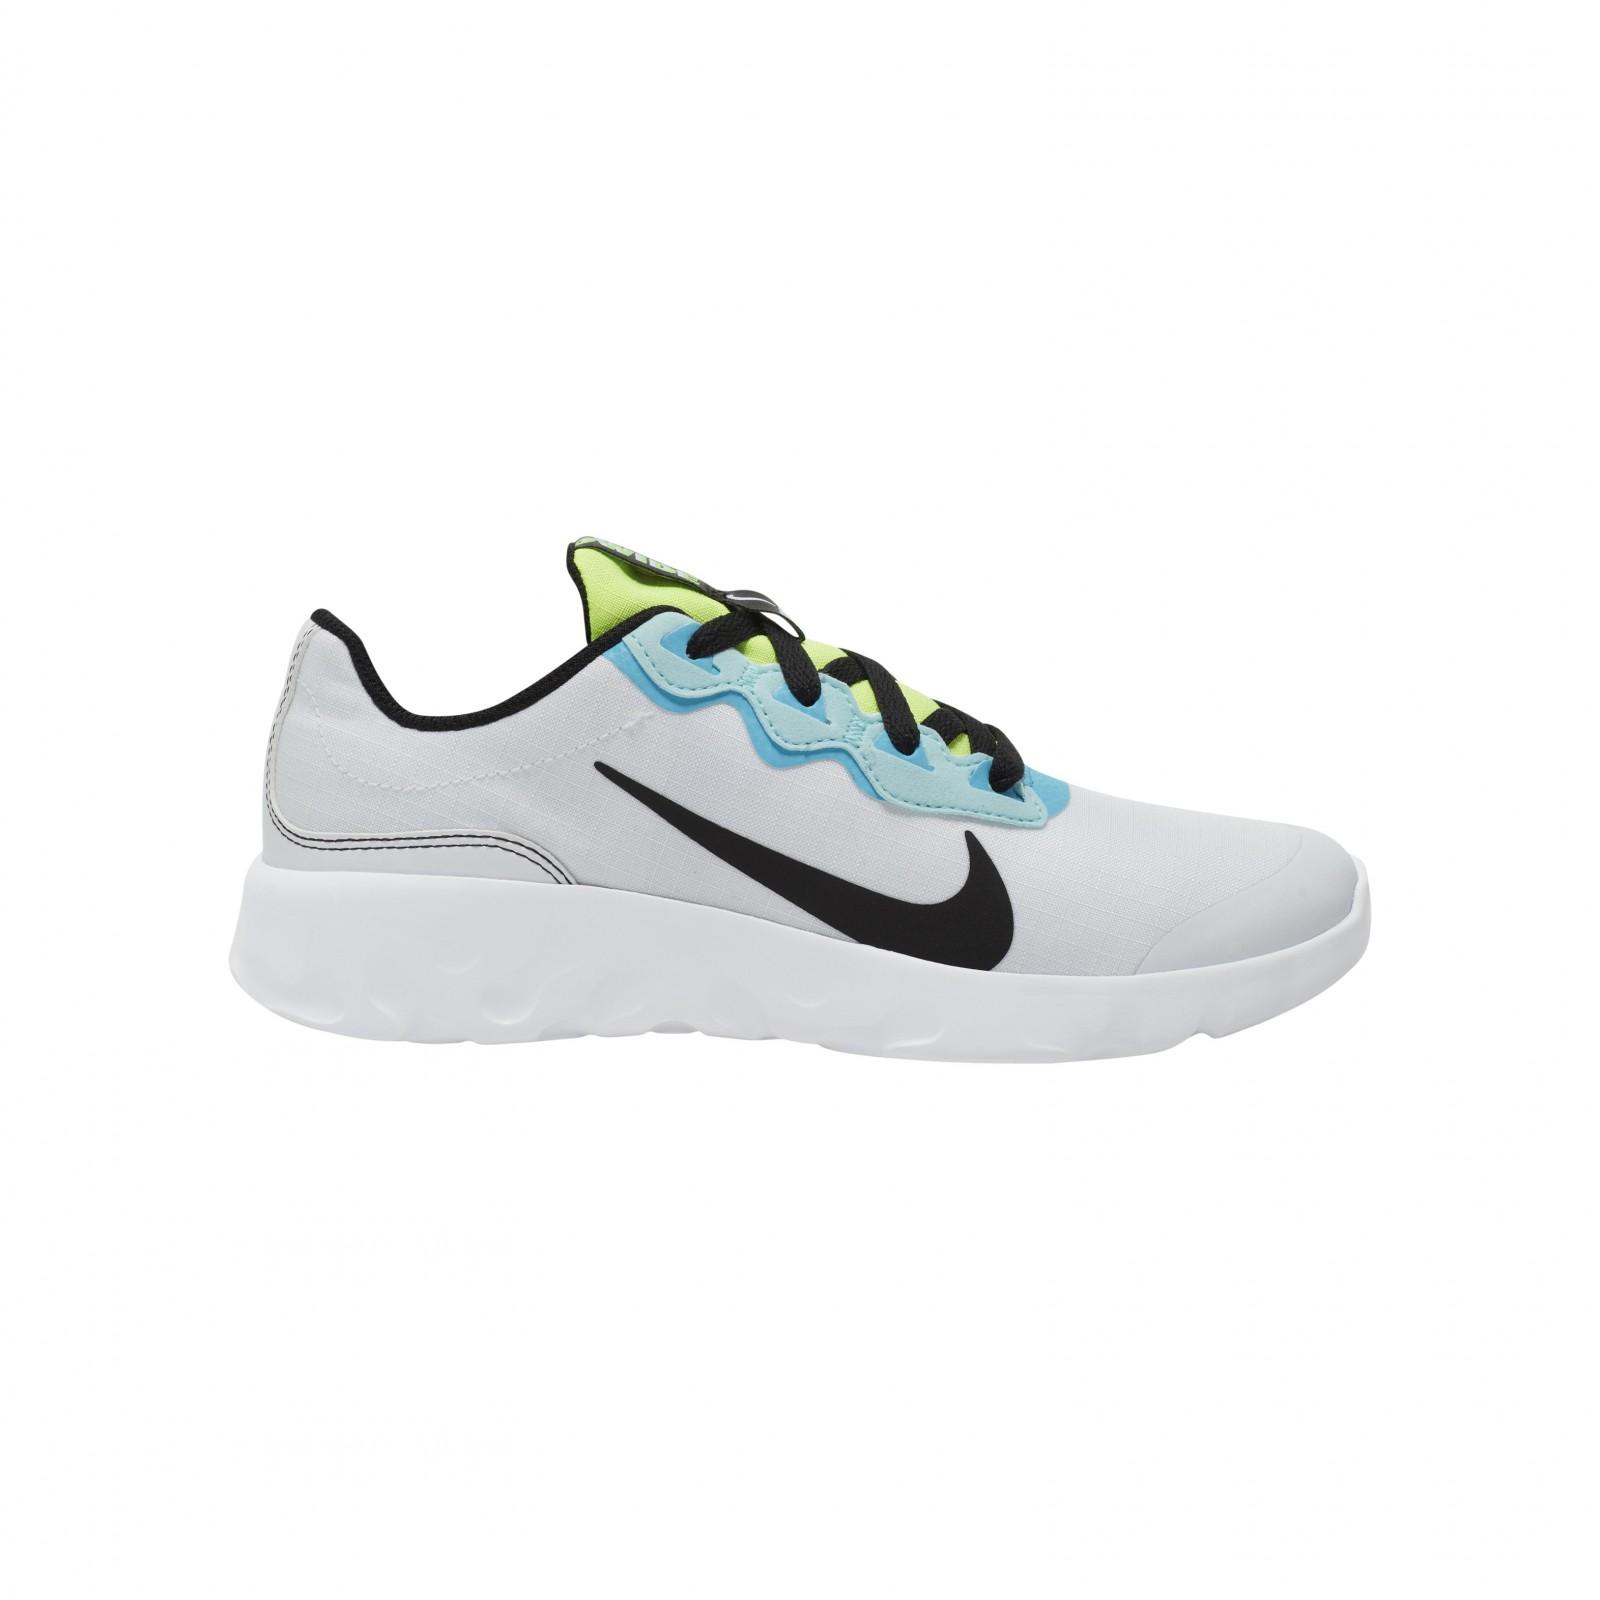 Nike explore strada (gs) WHITE/BLACK-BLUE FURY-GLACIER ICE